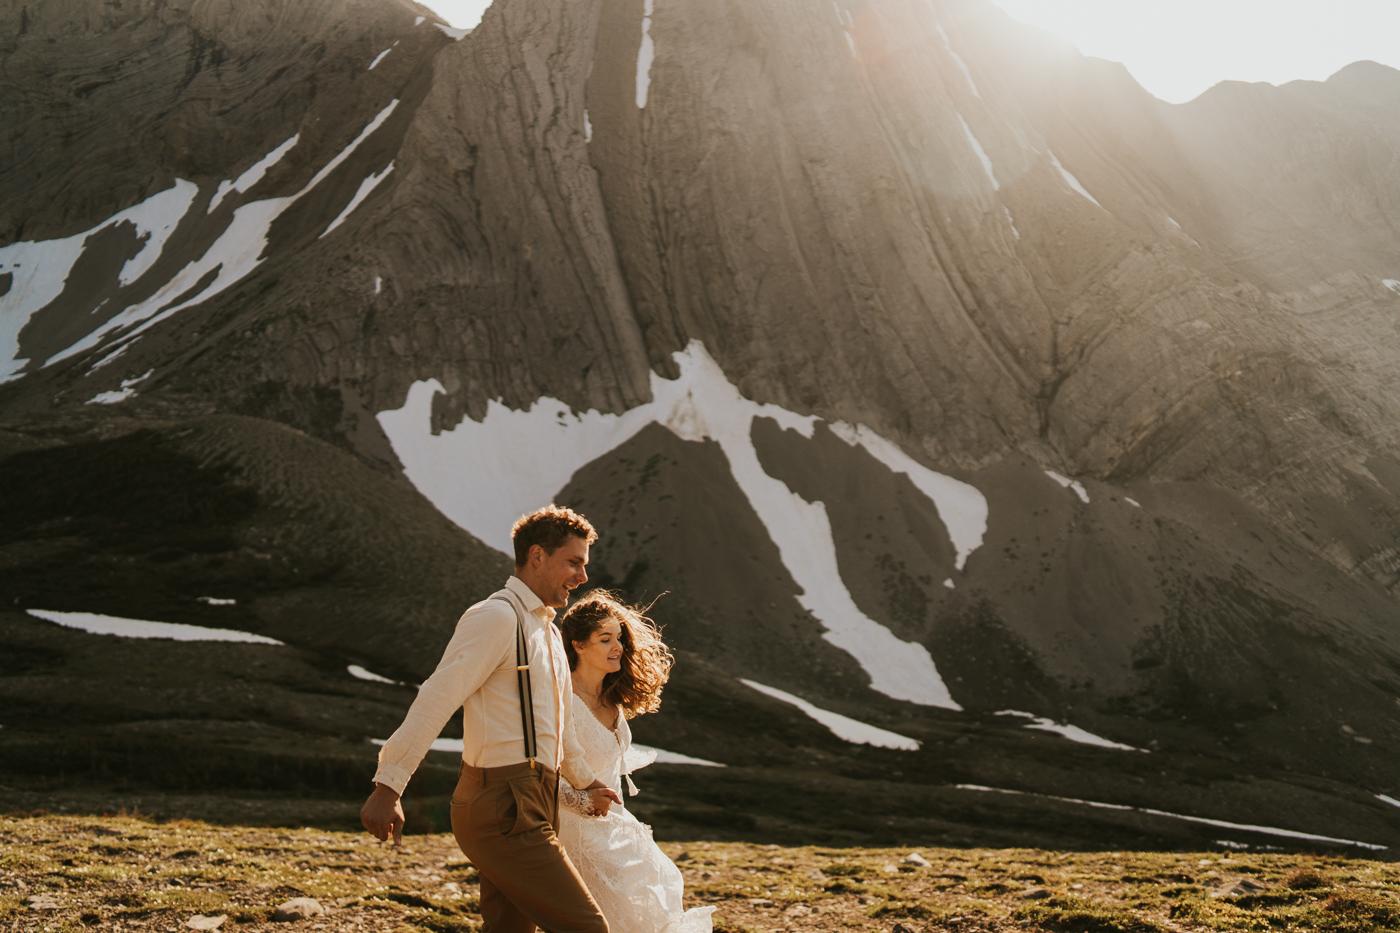 tyraephotography_photographer_wedding_elopement_engagement_photography-08414.jpg